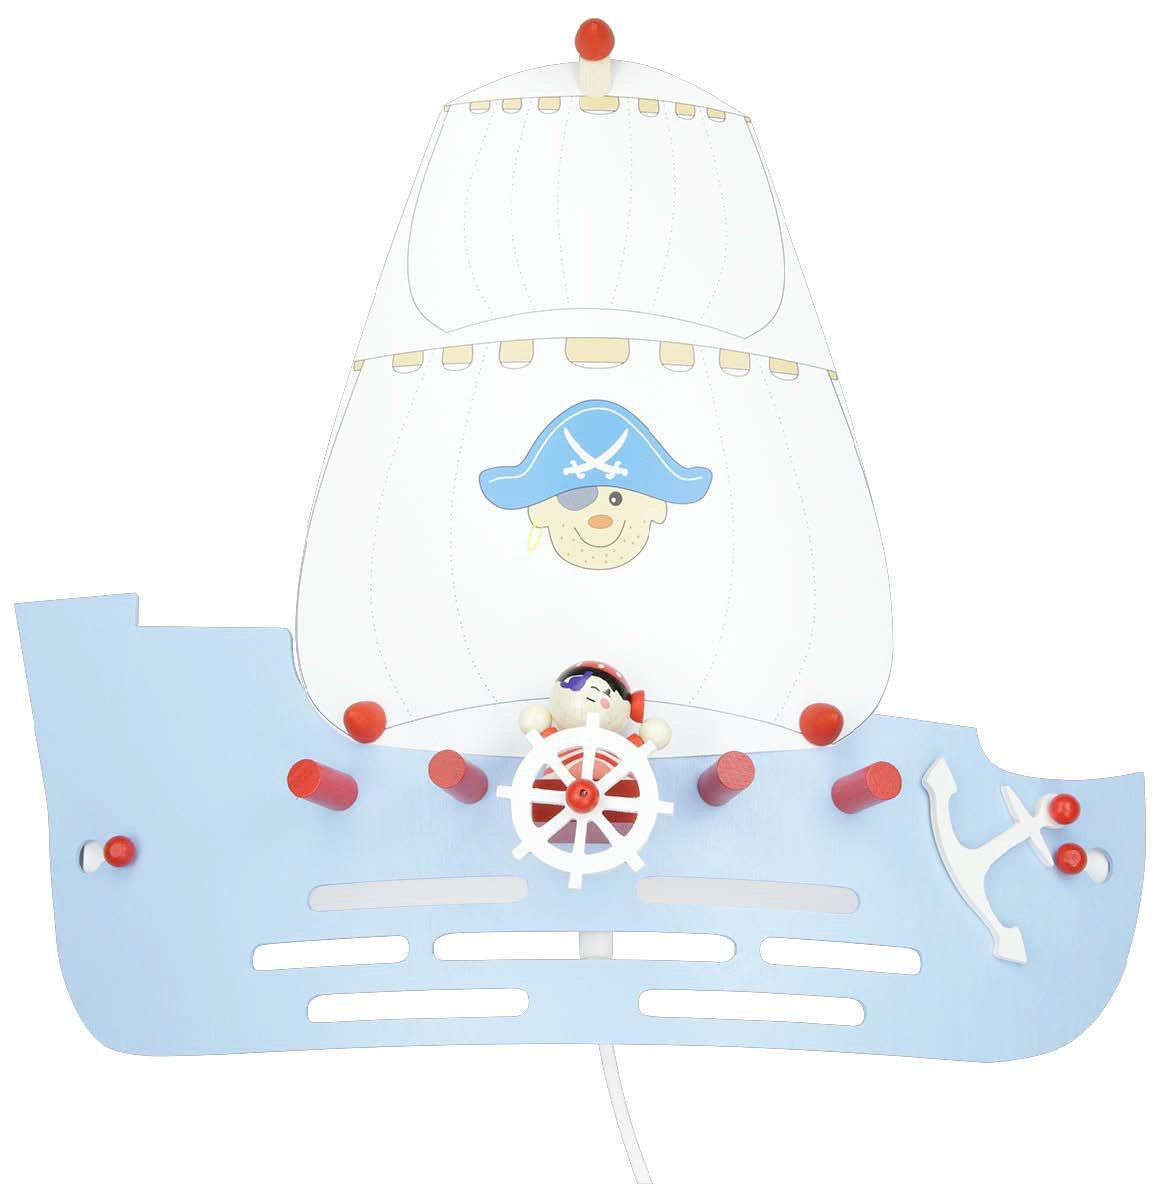 Elobra Wandleuchte Piratenschiff, 1 flammig ELO-125809